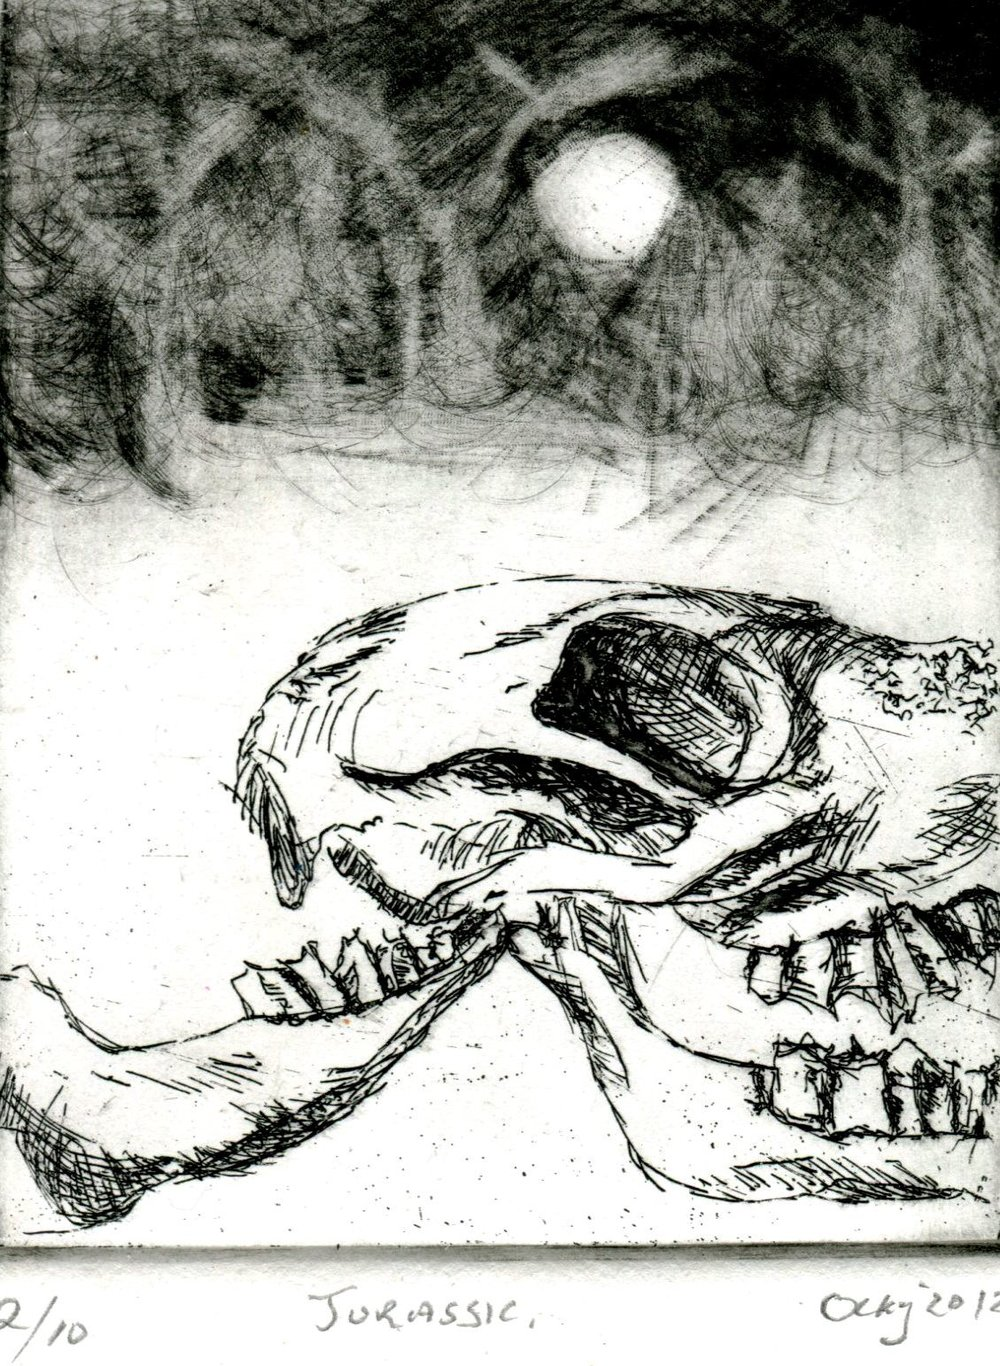 52c Ockert Kruger, Jurassic, Etching on paper